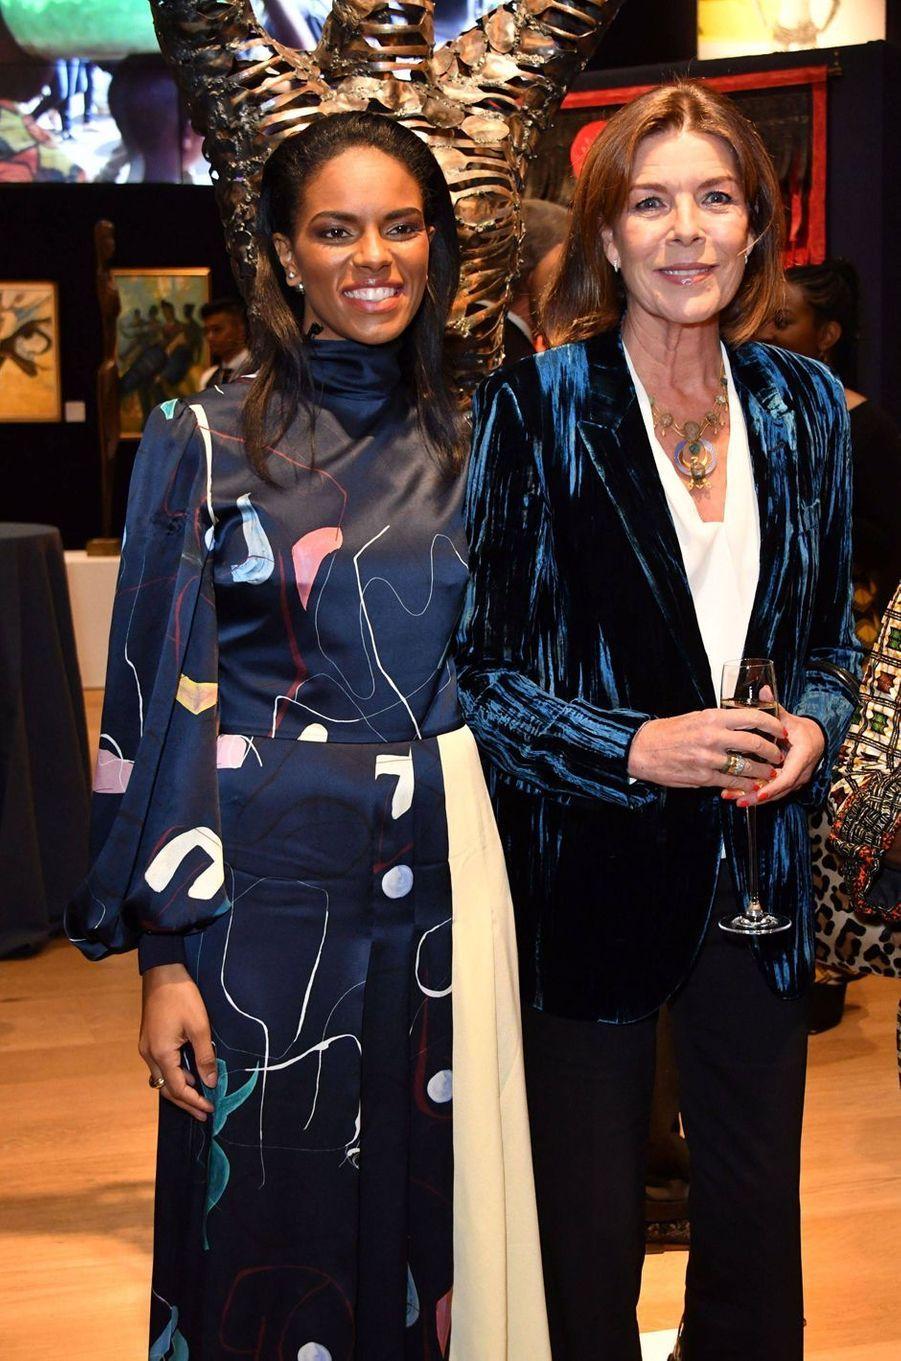 La princesse Caroline de Monaco avec Noëlla Coursaris Musunka à Londres, le 1er octobre 2018